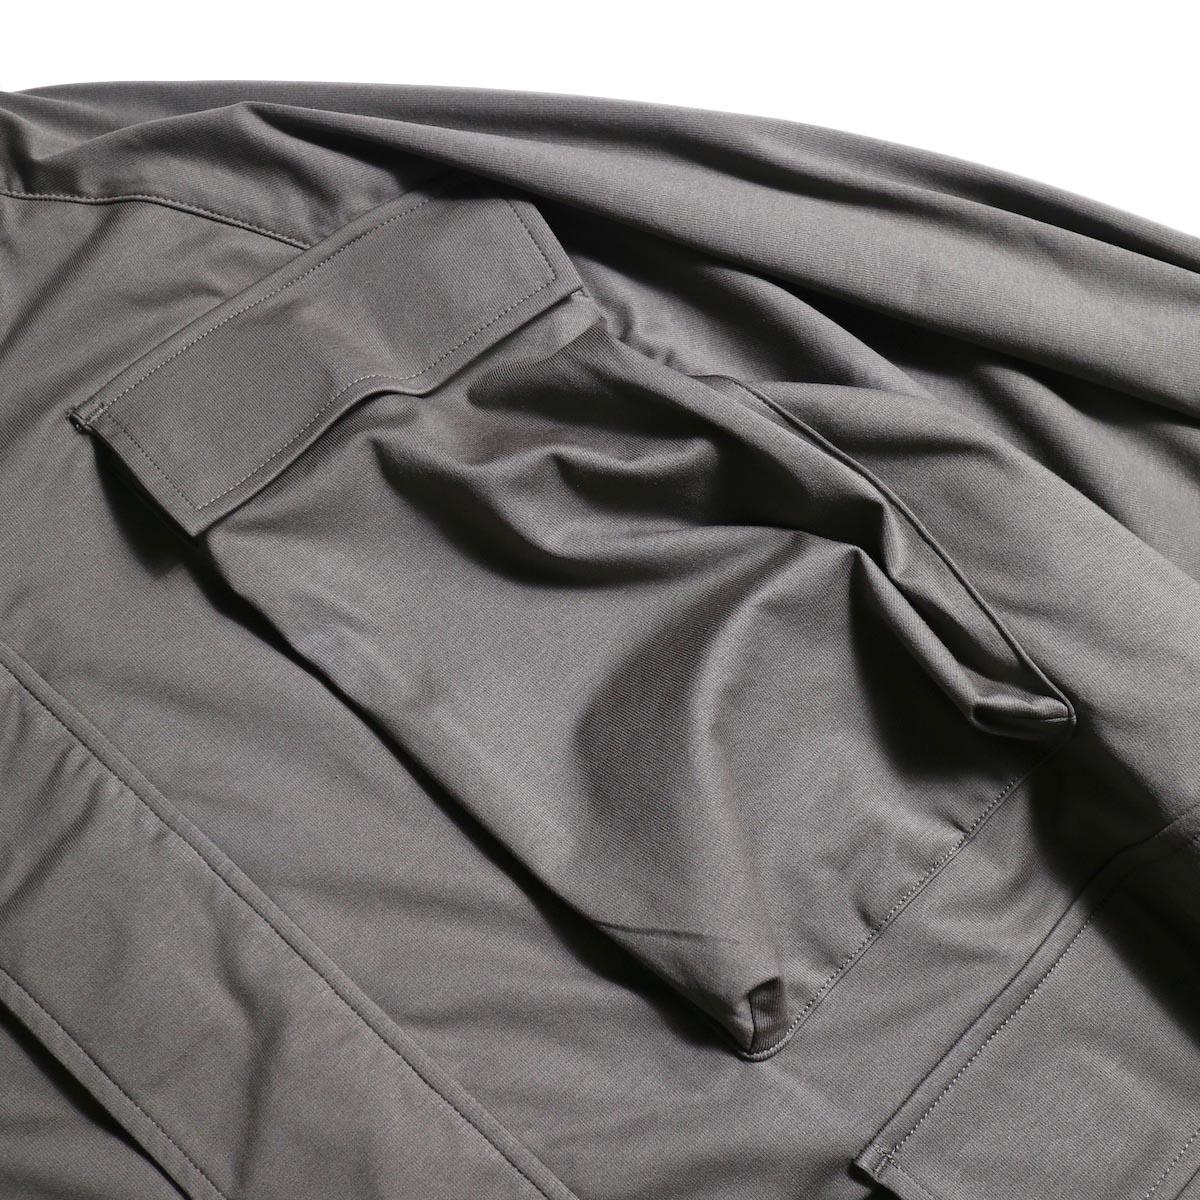 BASISBROEK / FORCE (Khaki)ポケット